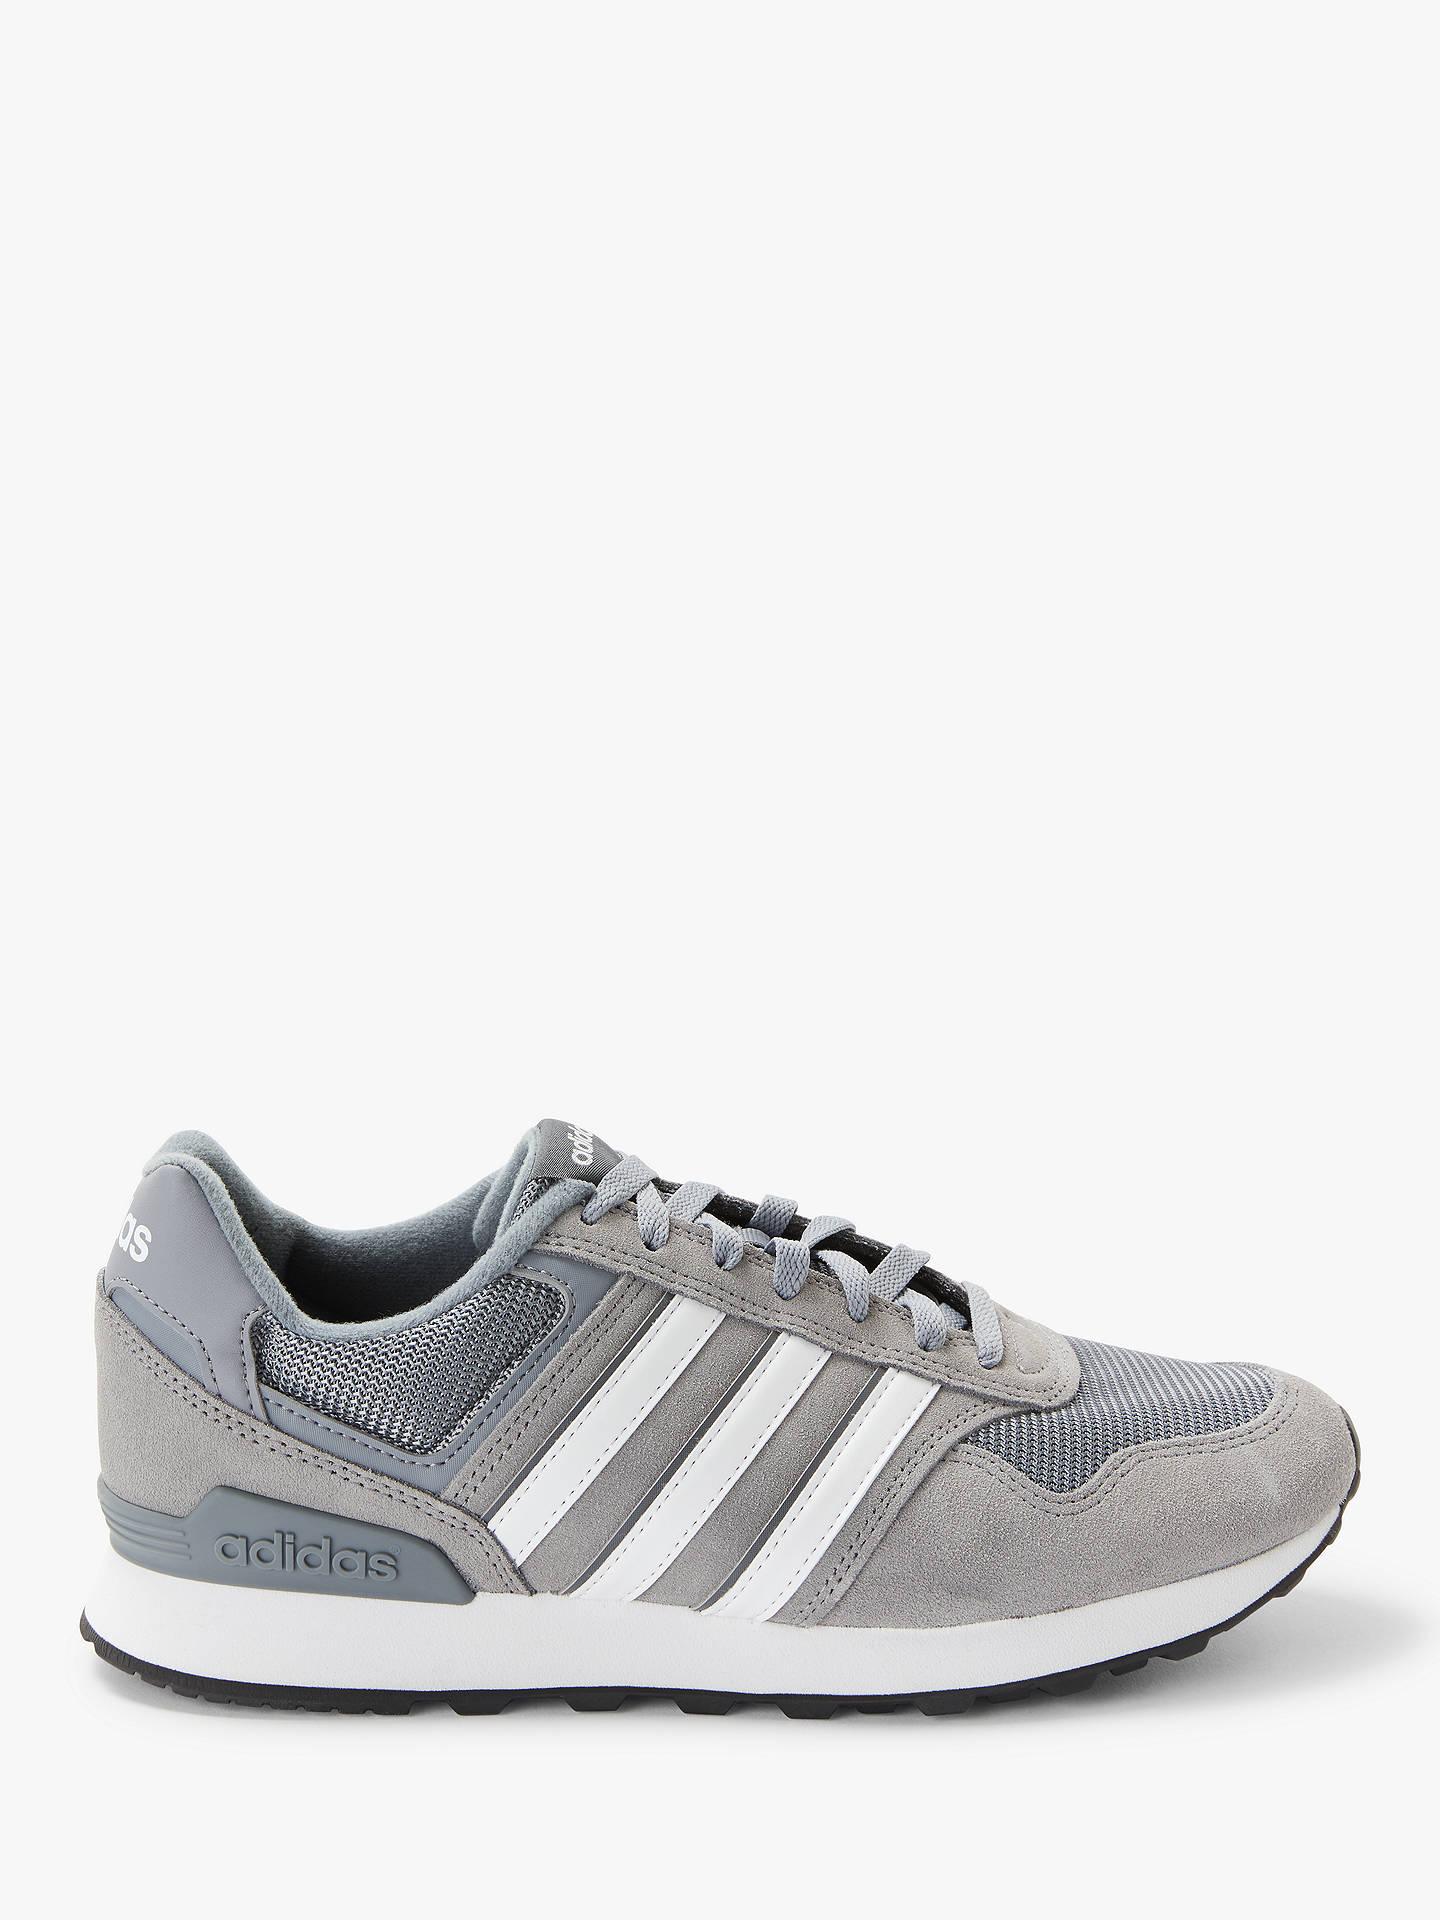 cf9a48736 adidas 10k Men s Running Shoes at John Lewis   Partners